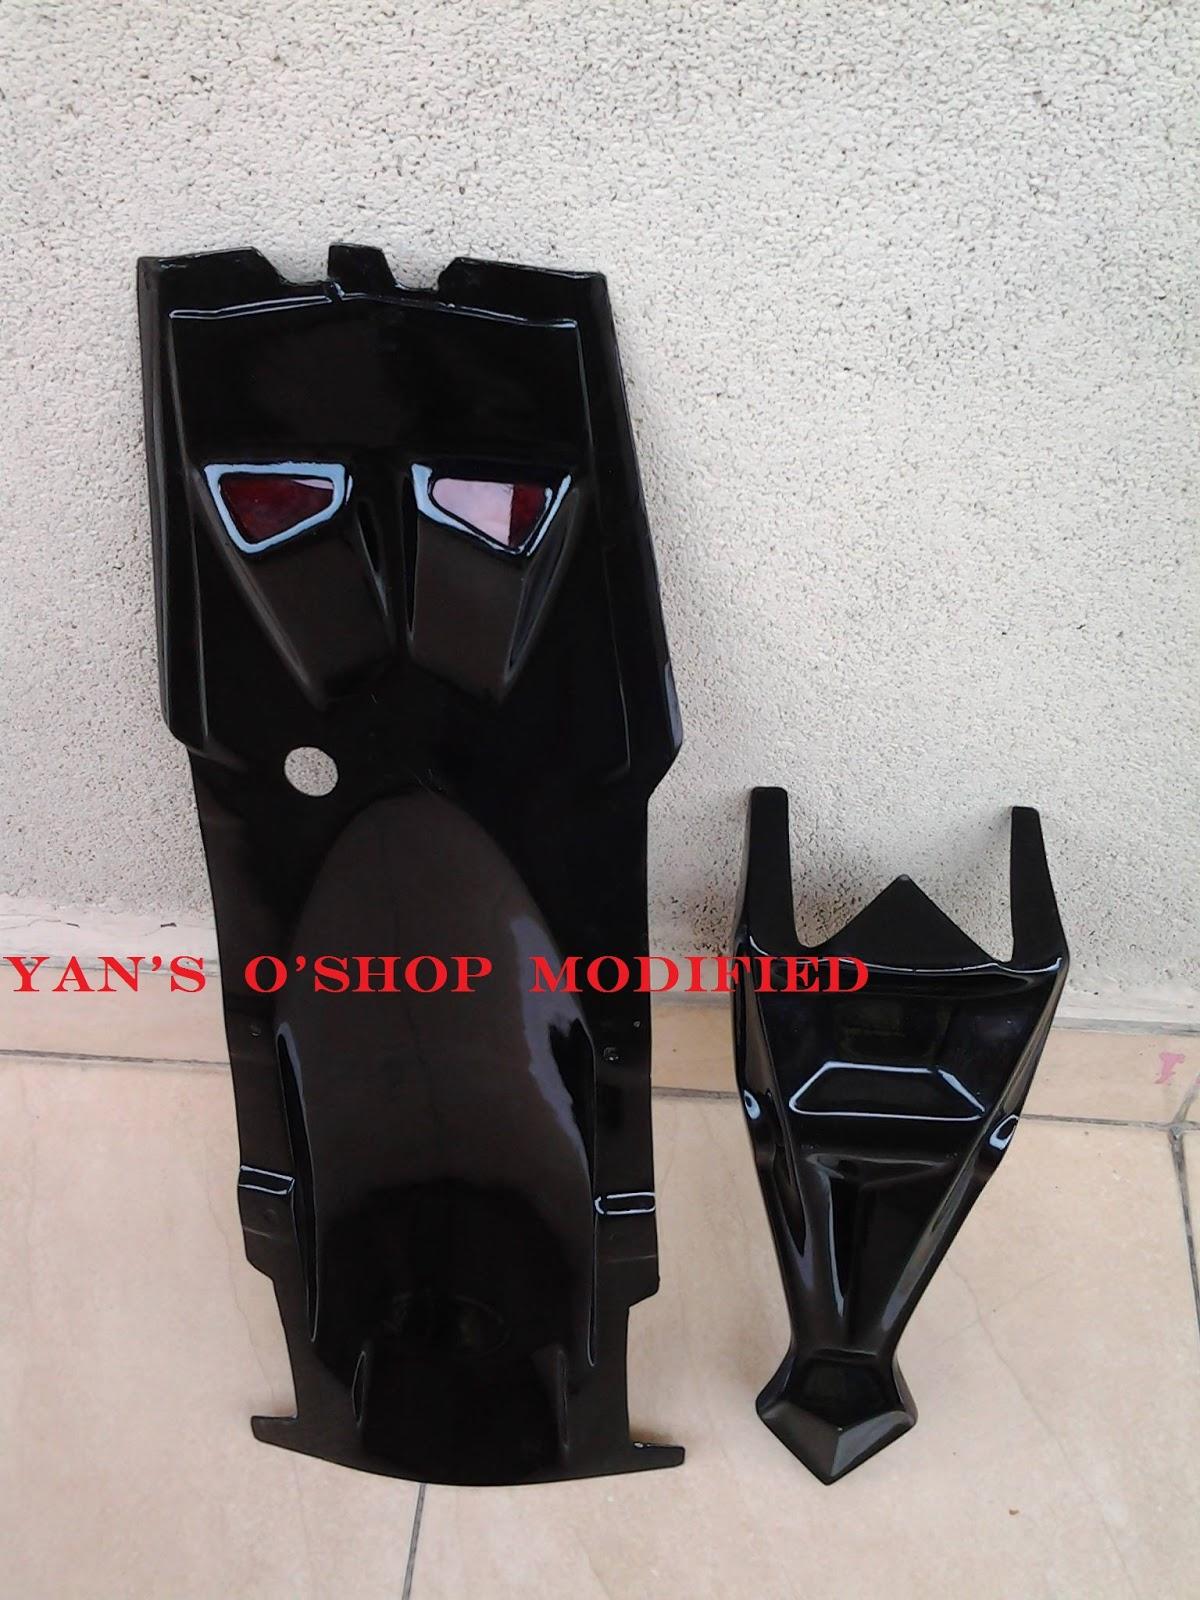 Yans Oshop Variasi Motor UNDERTAIL SIGN FIBER FOR NVL